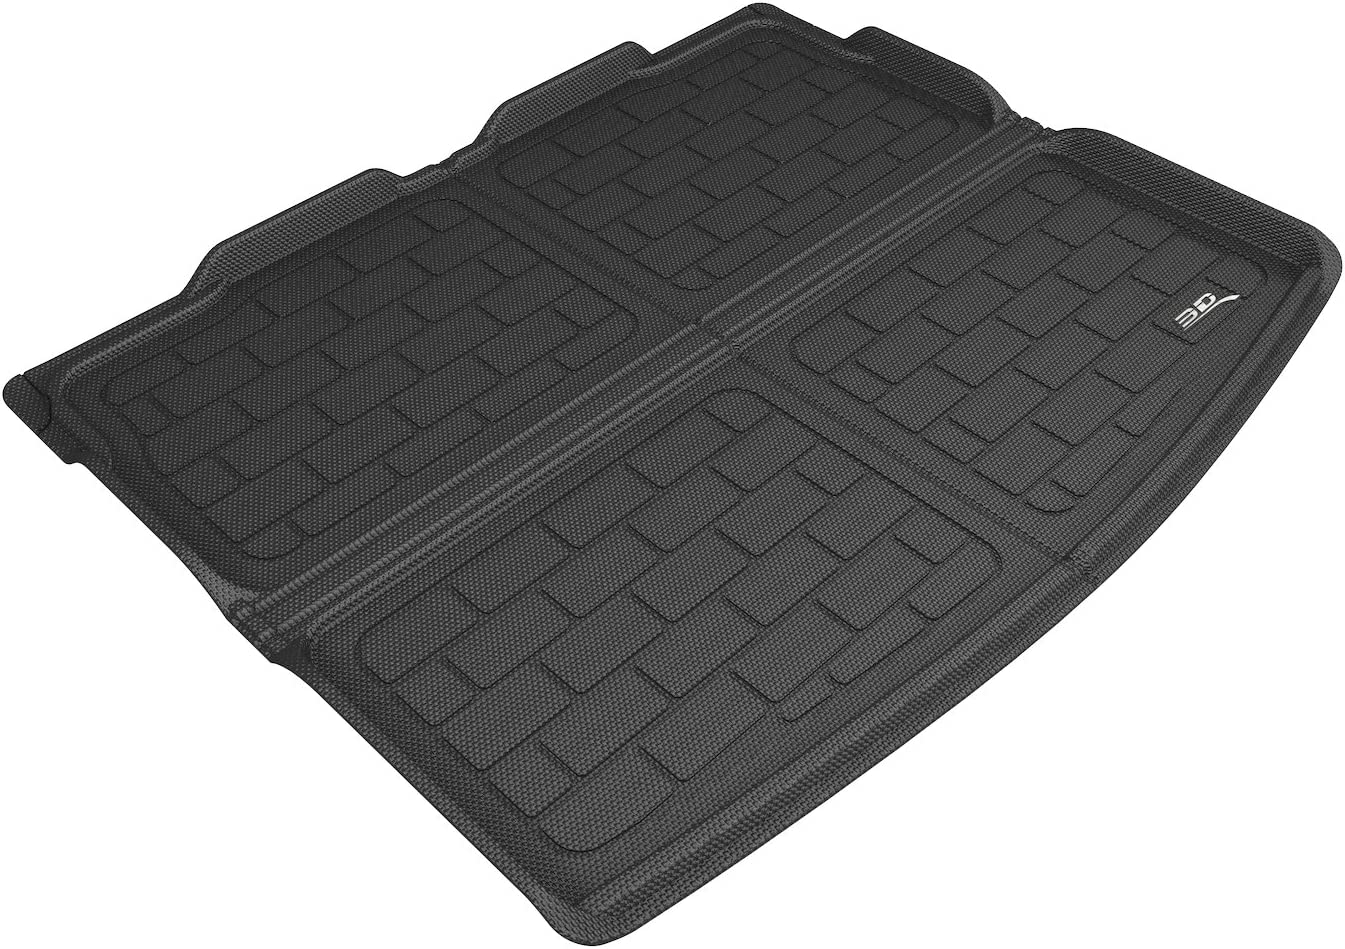 3D MAXpider M1JP0161309 Cargo Custom Fit All-Floor Mat for Select Jeep Compass Models-Kagu Rubber Black